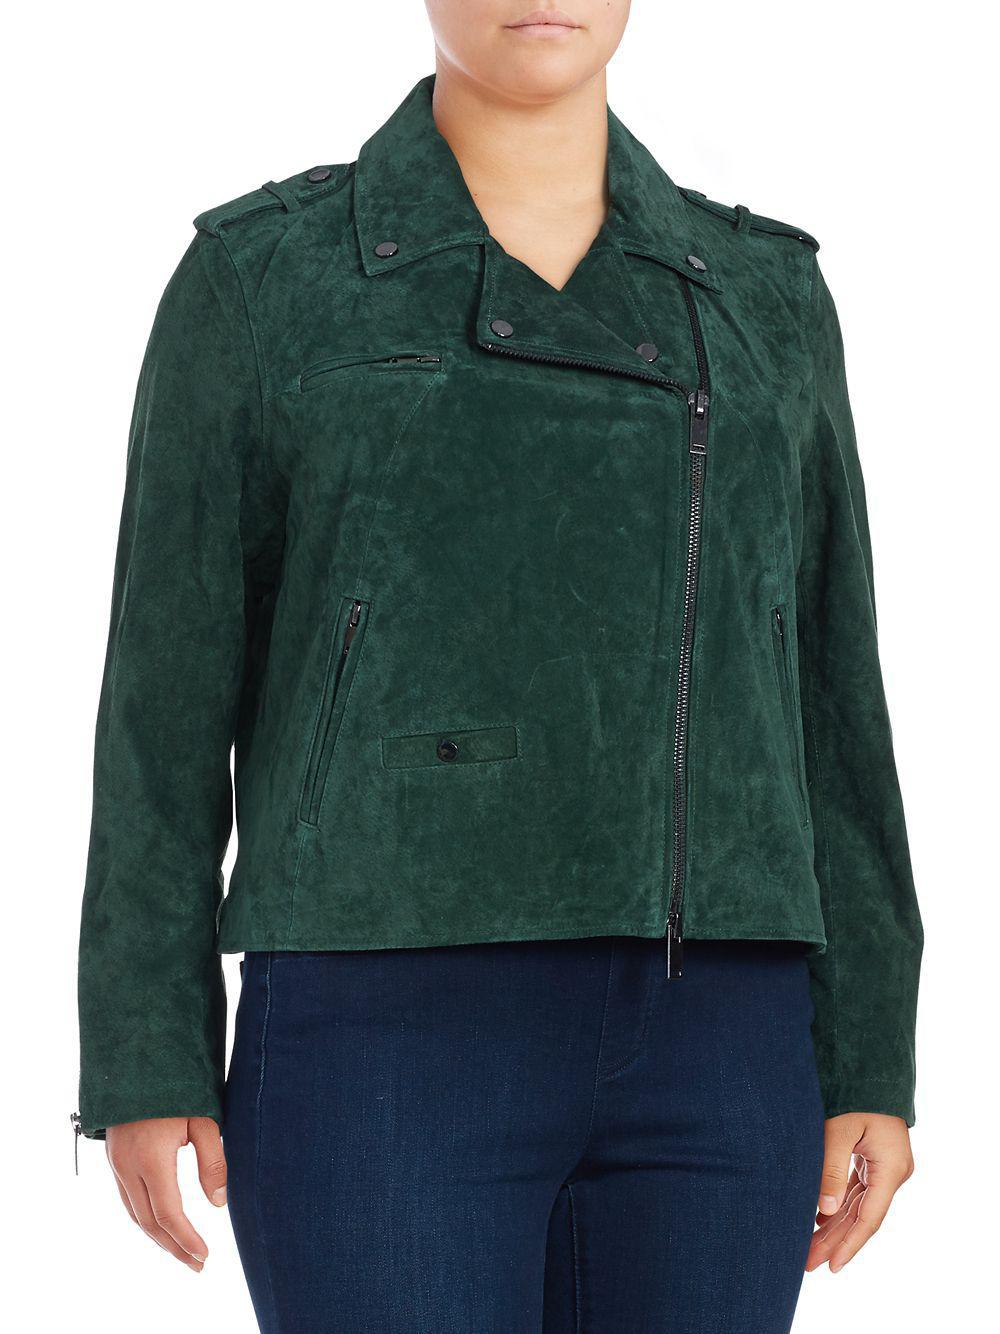 d1165a575e2 Rebel Wilson X Angels Plus Rebe s Suede Moto Jacket in Green - Lyst